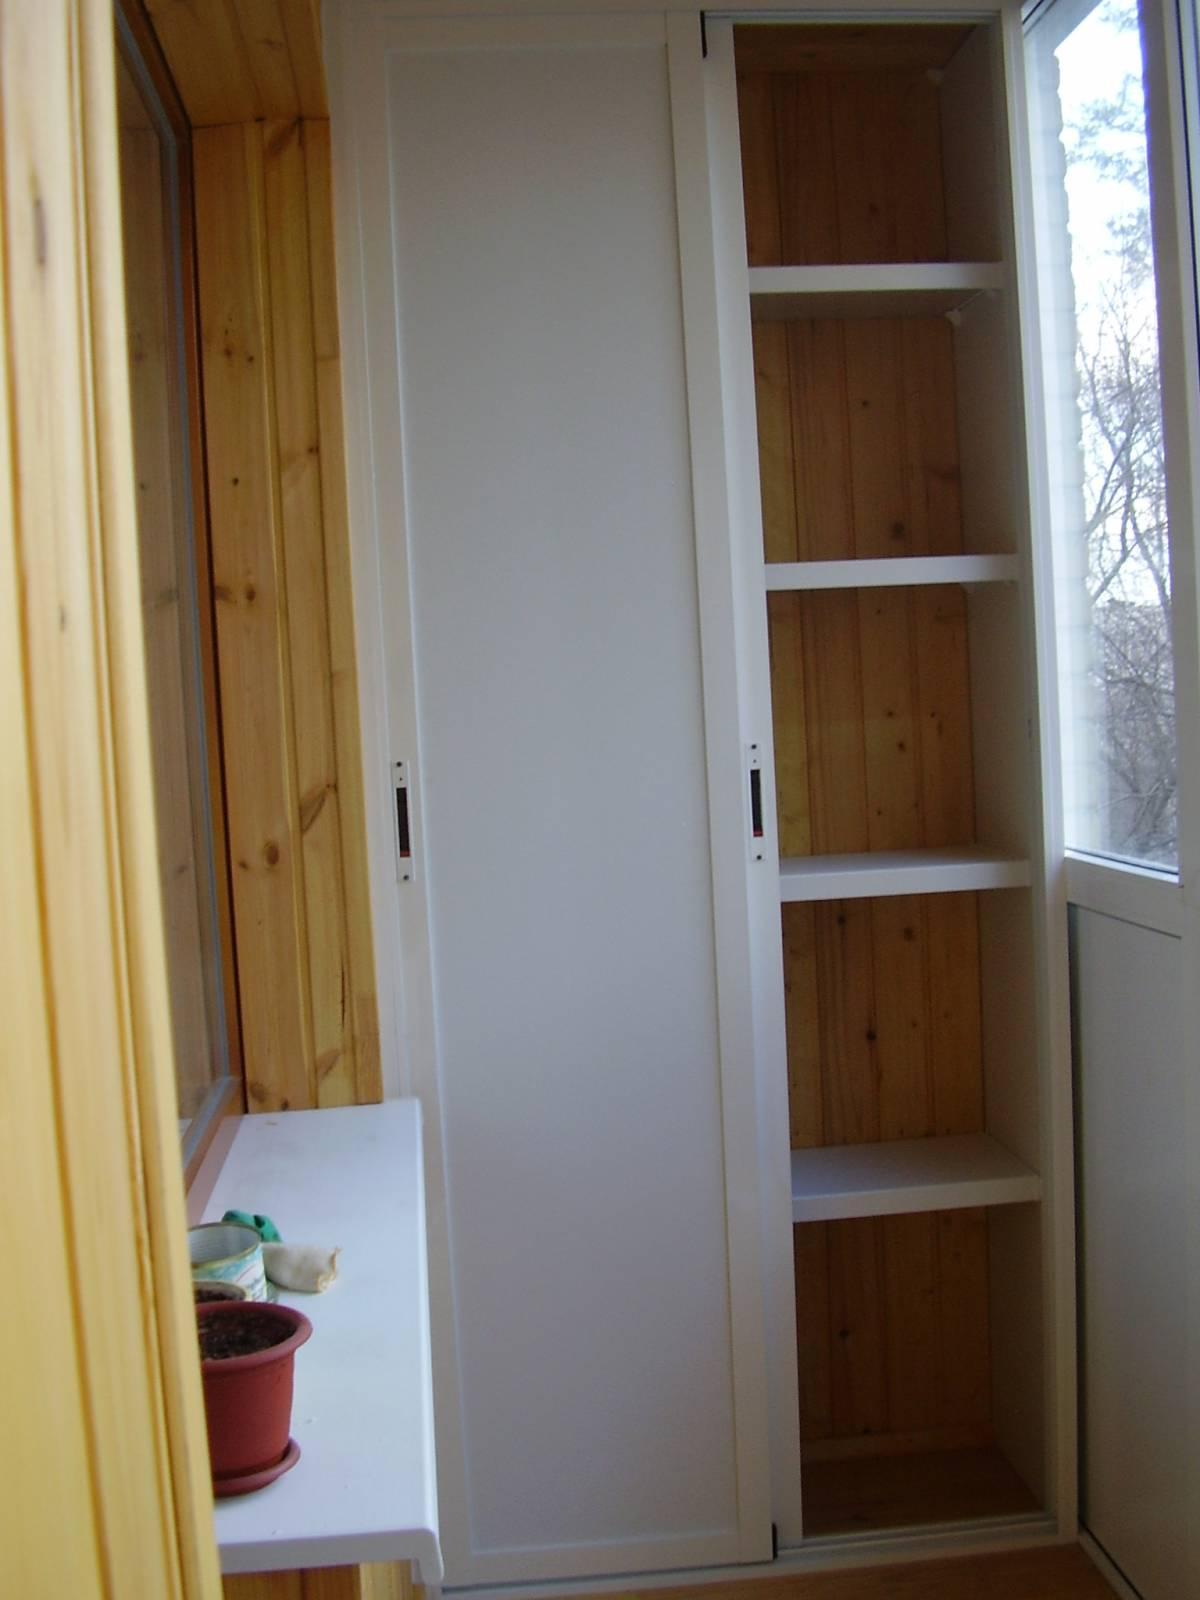 Шкафы купе на балкон в москве дешево..